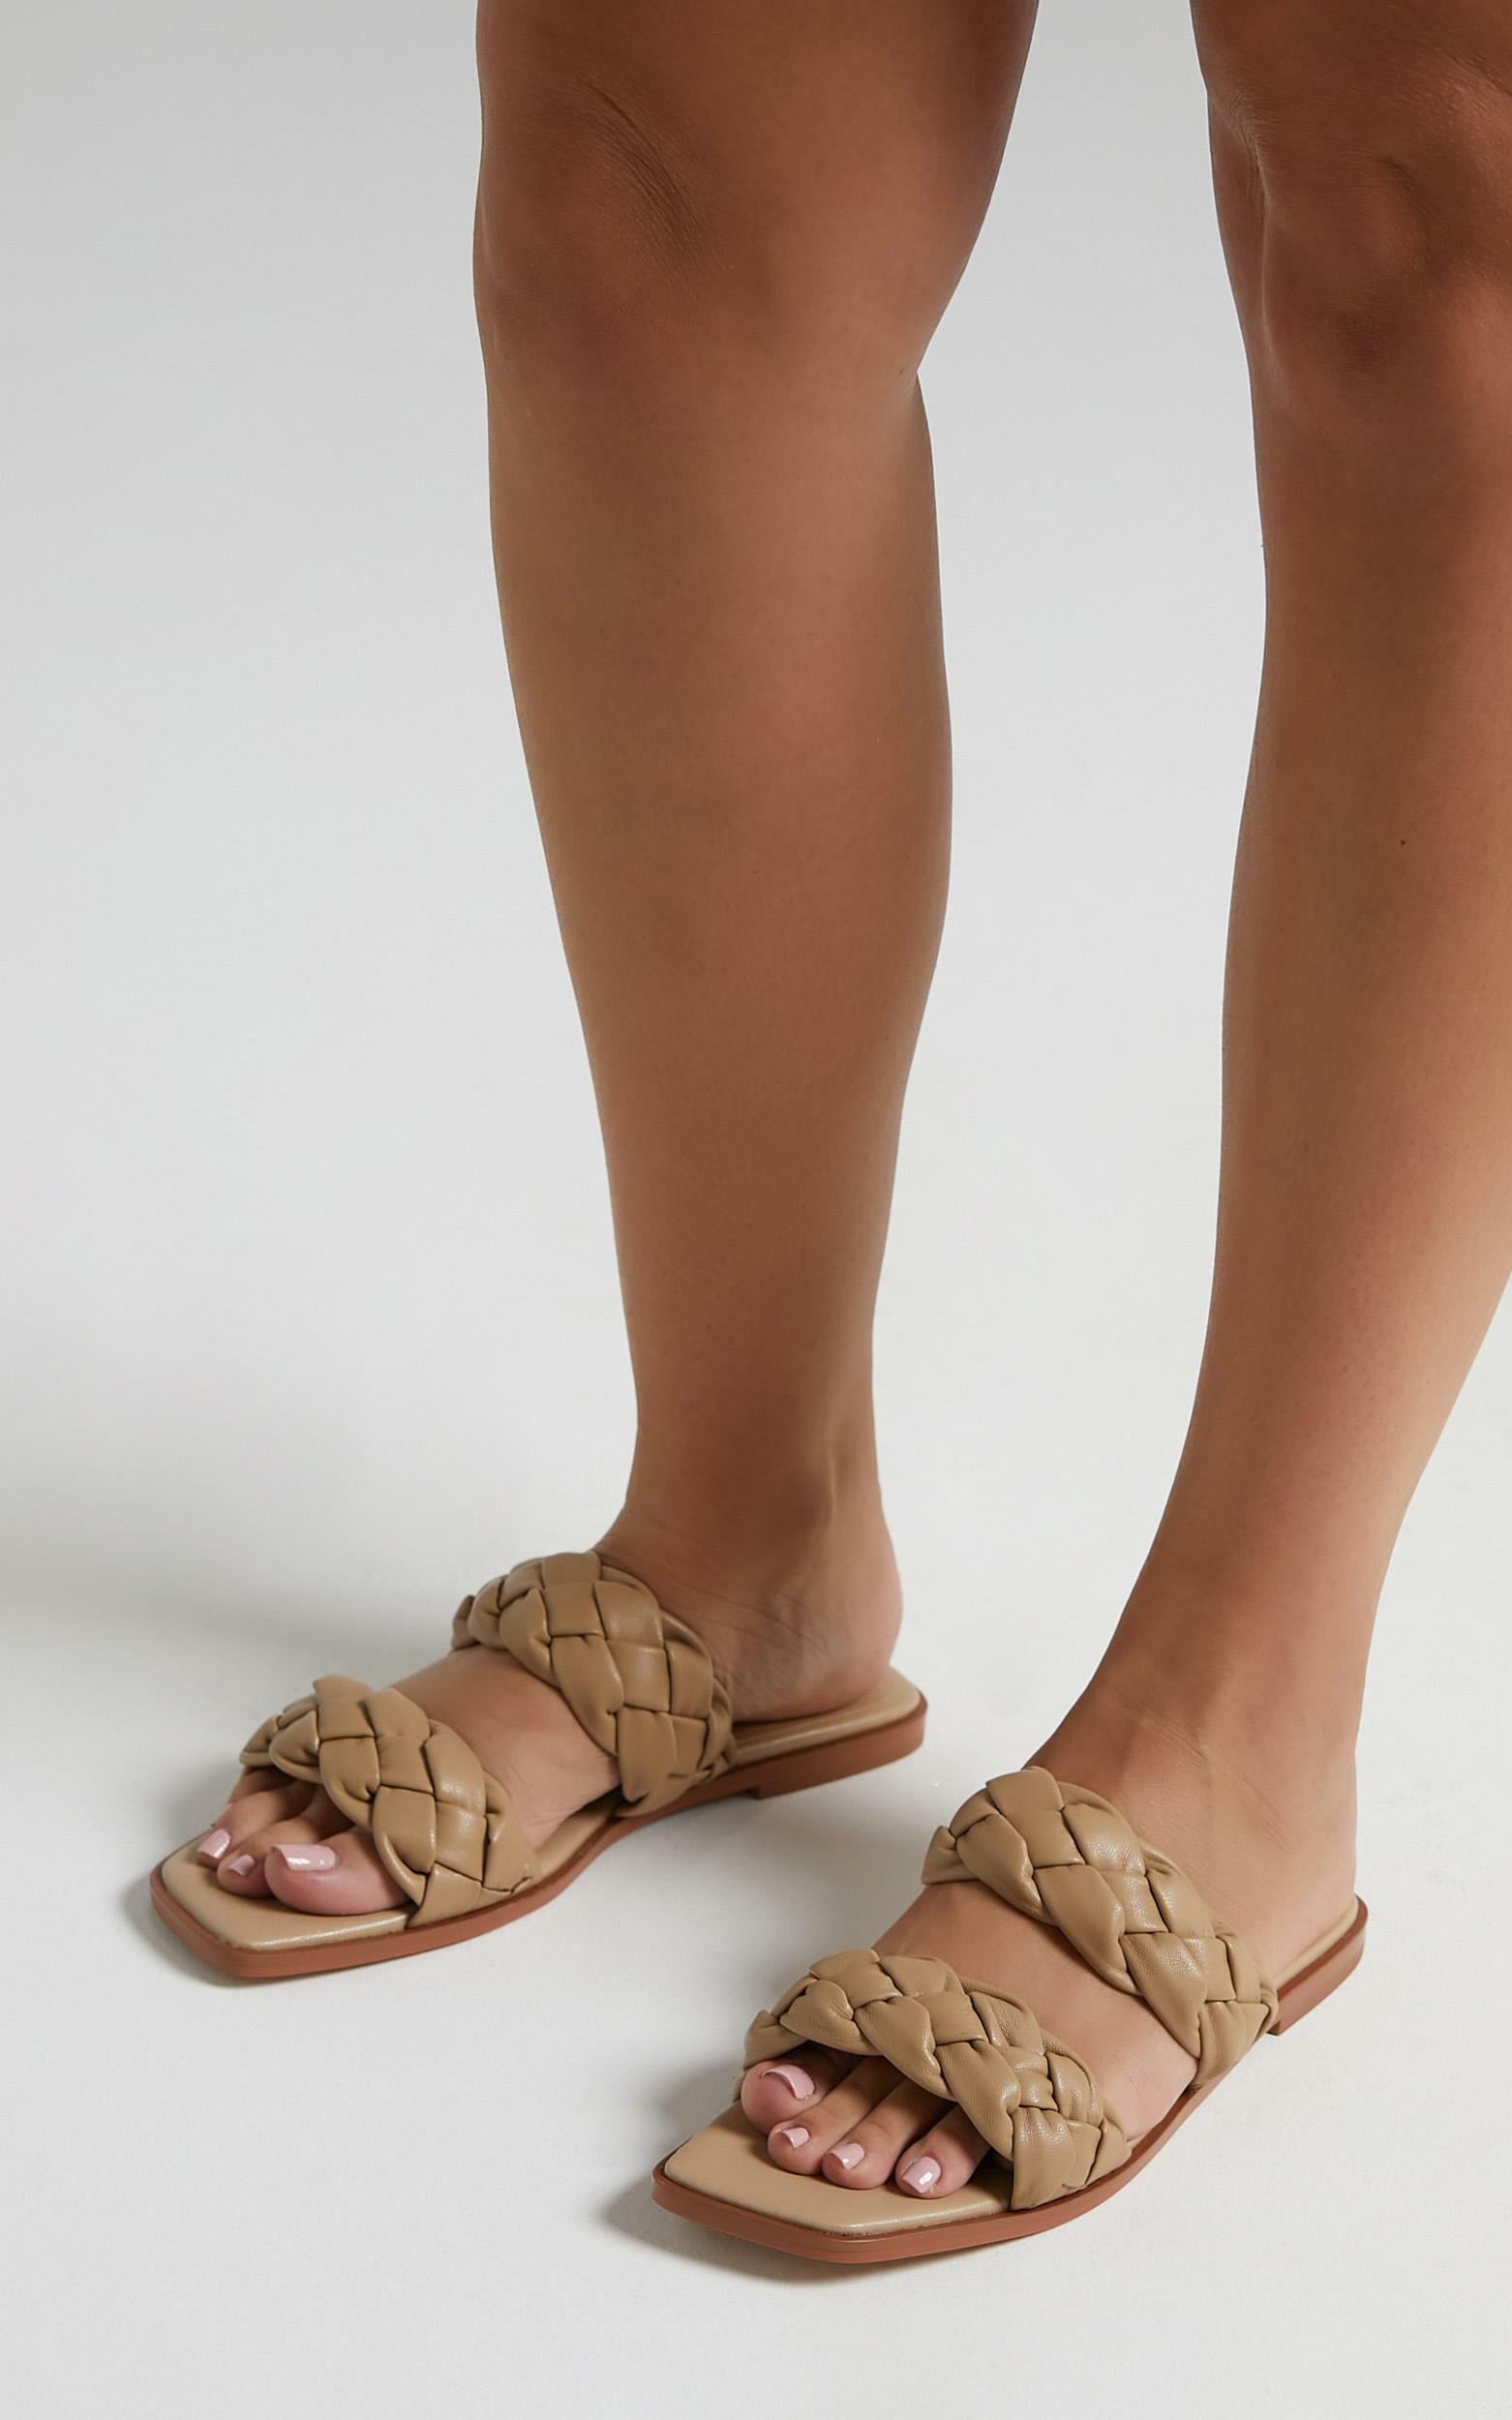 Alias Mae - Turner Sandals in Natural Leather - 5.5, BRN1, hi-res image number null